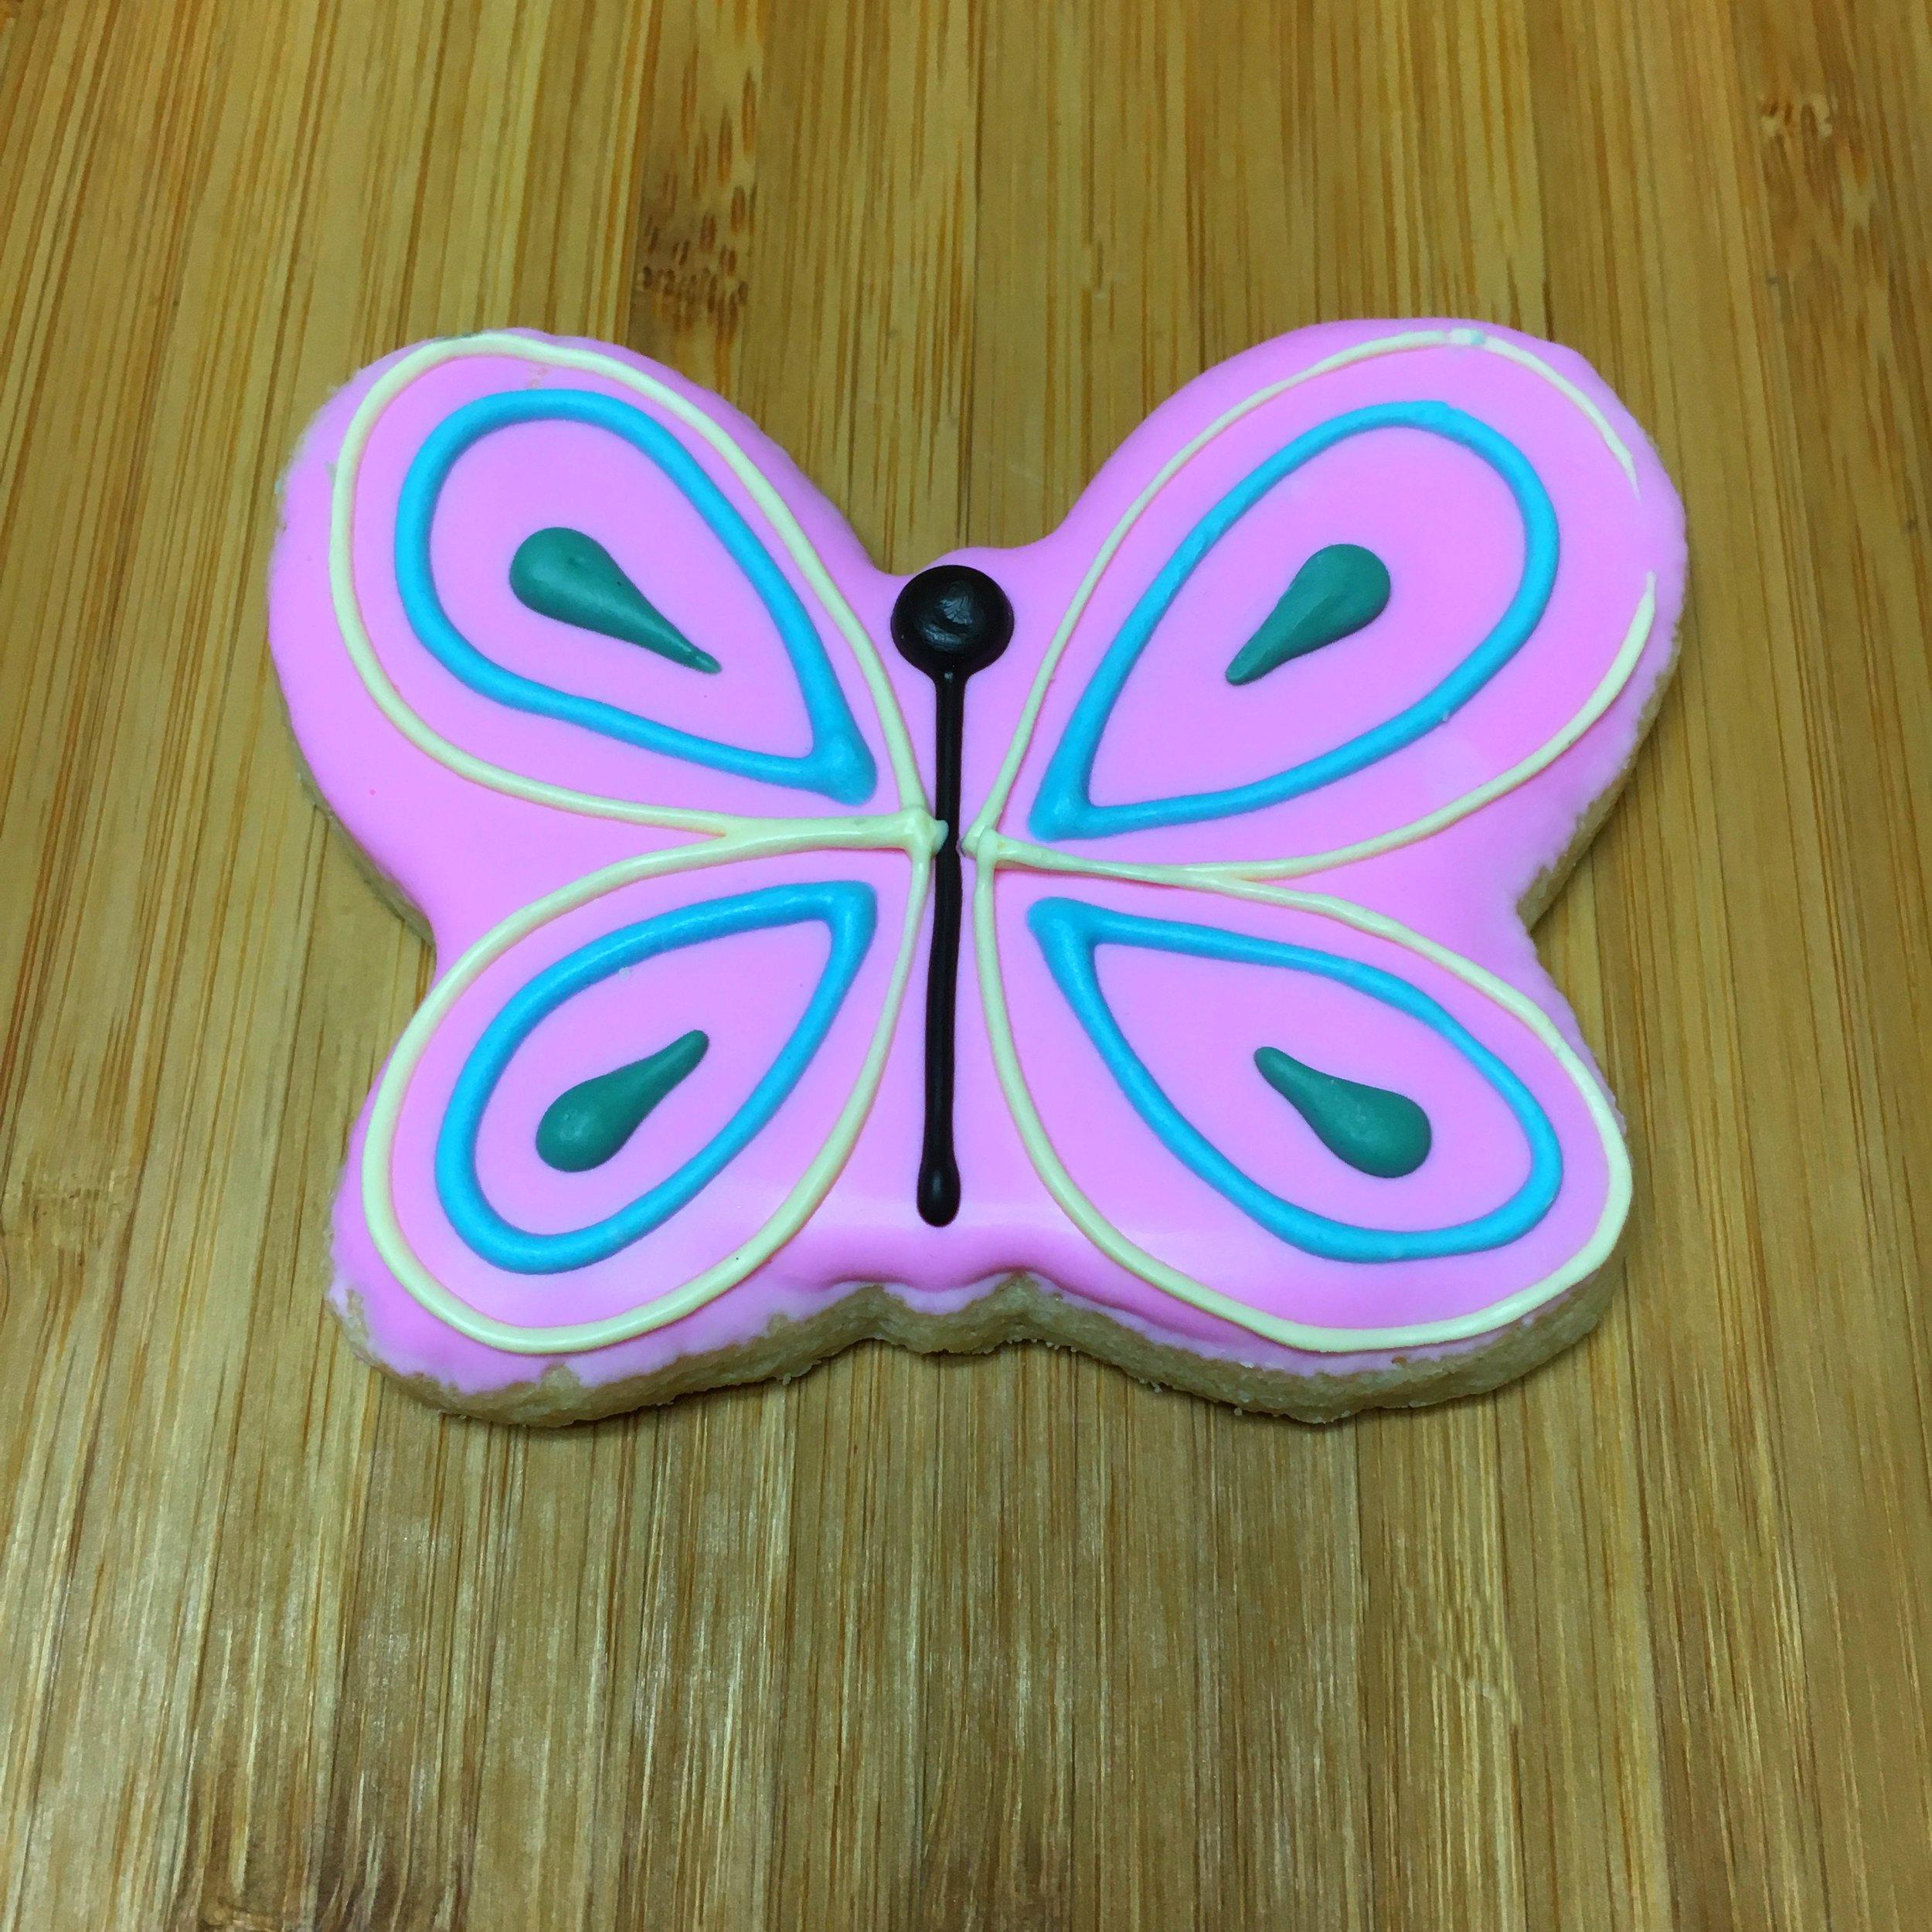 Fauna - Small Butterfly (1).JPG